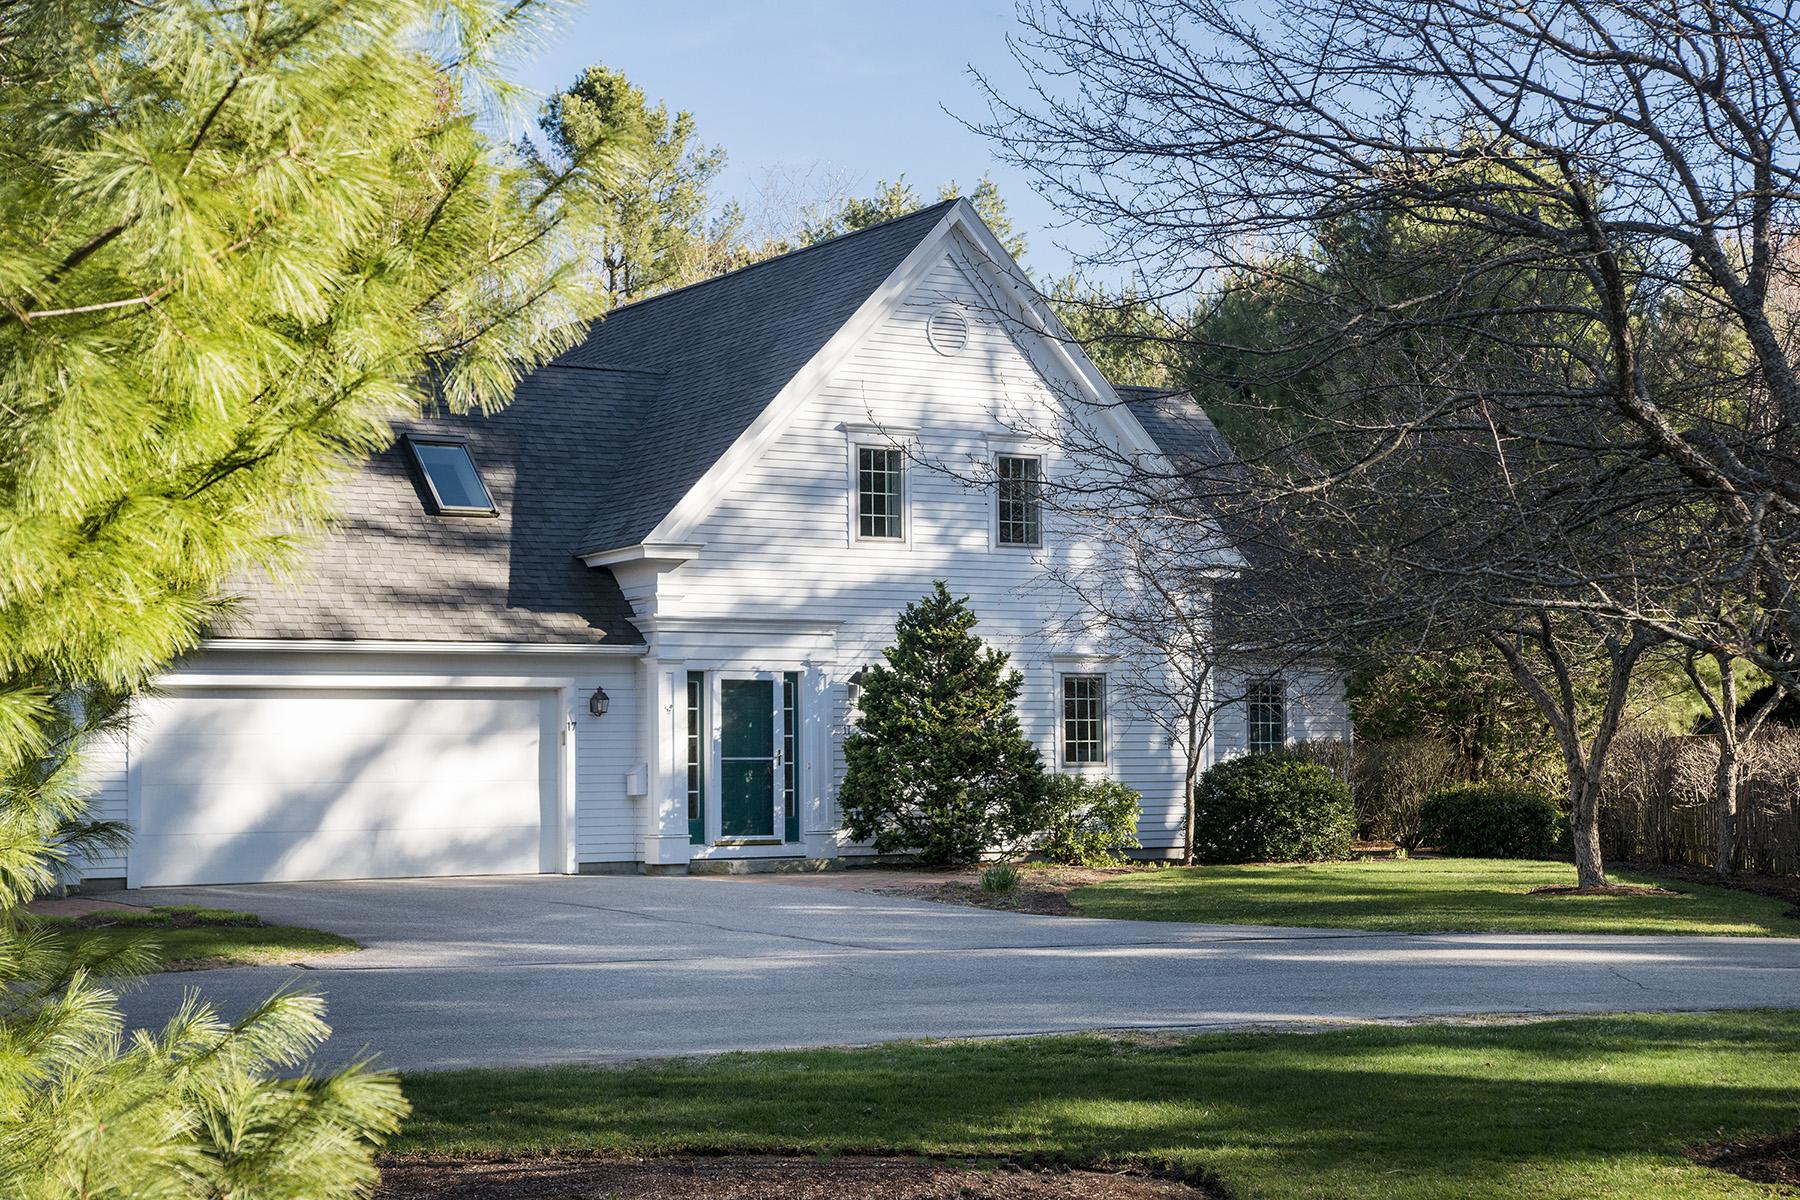 Condominium for Sale at Zeitler Farm 17 Zeitler Farm Road Brunswick, Maine, 04011 United States